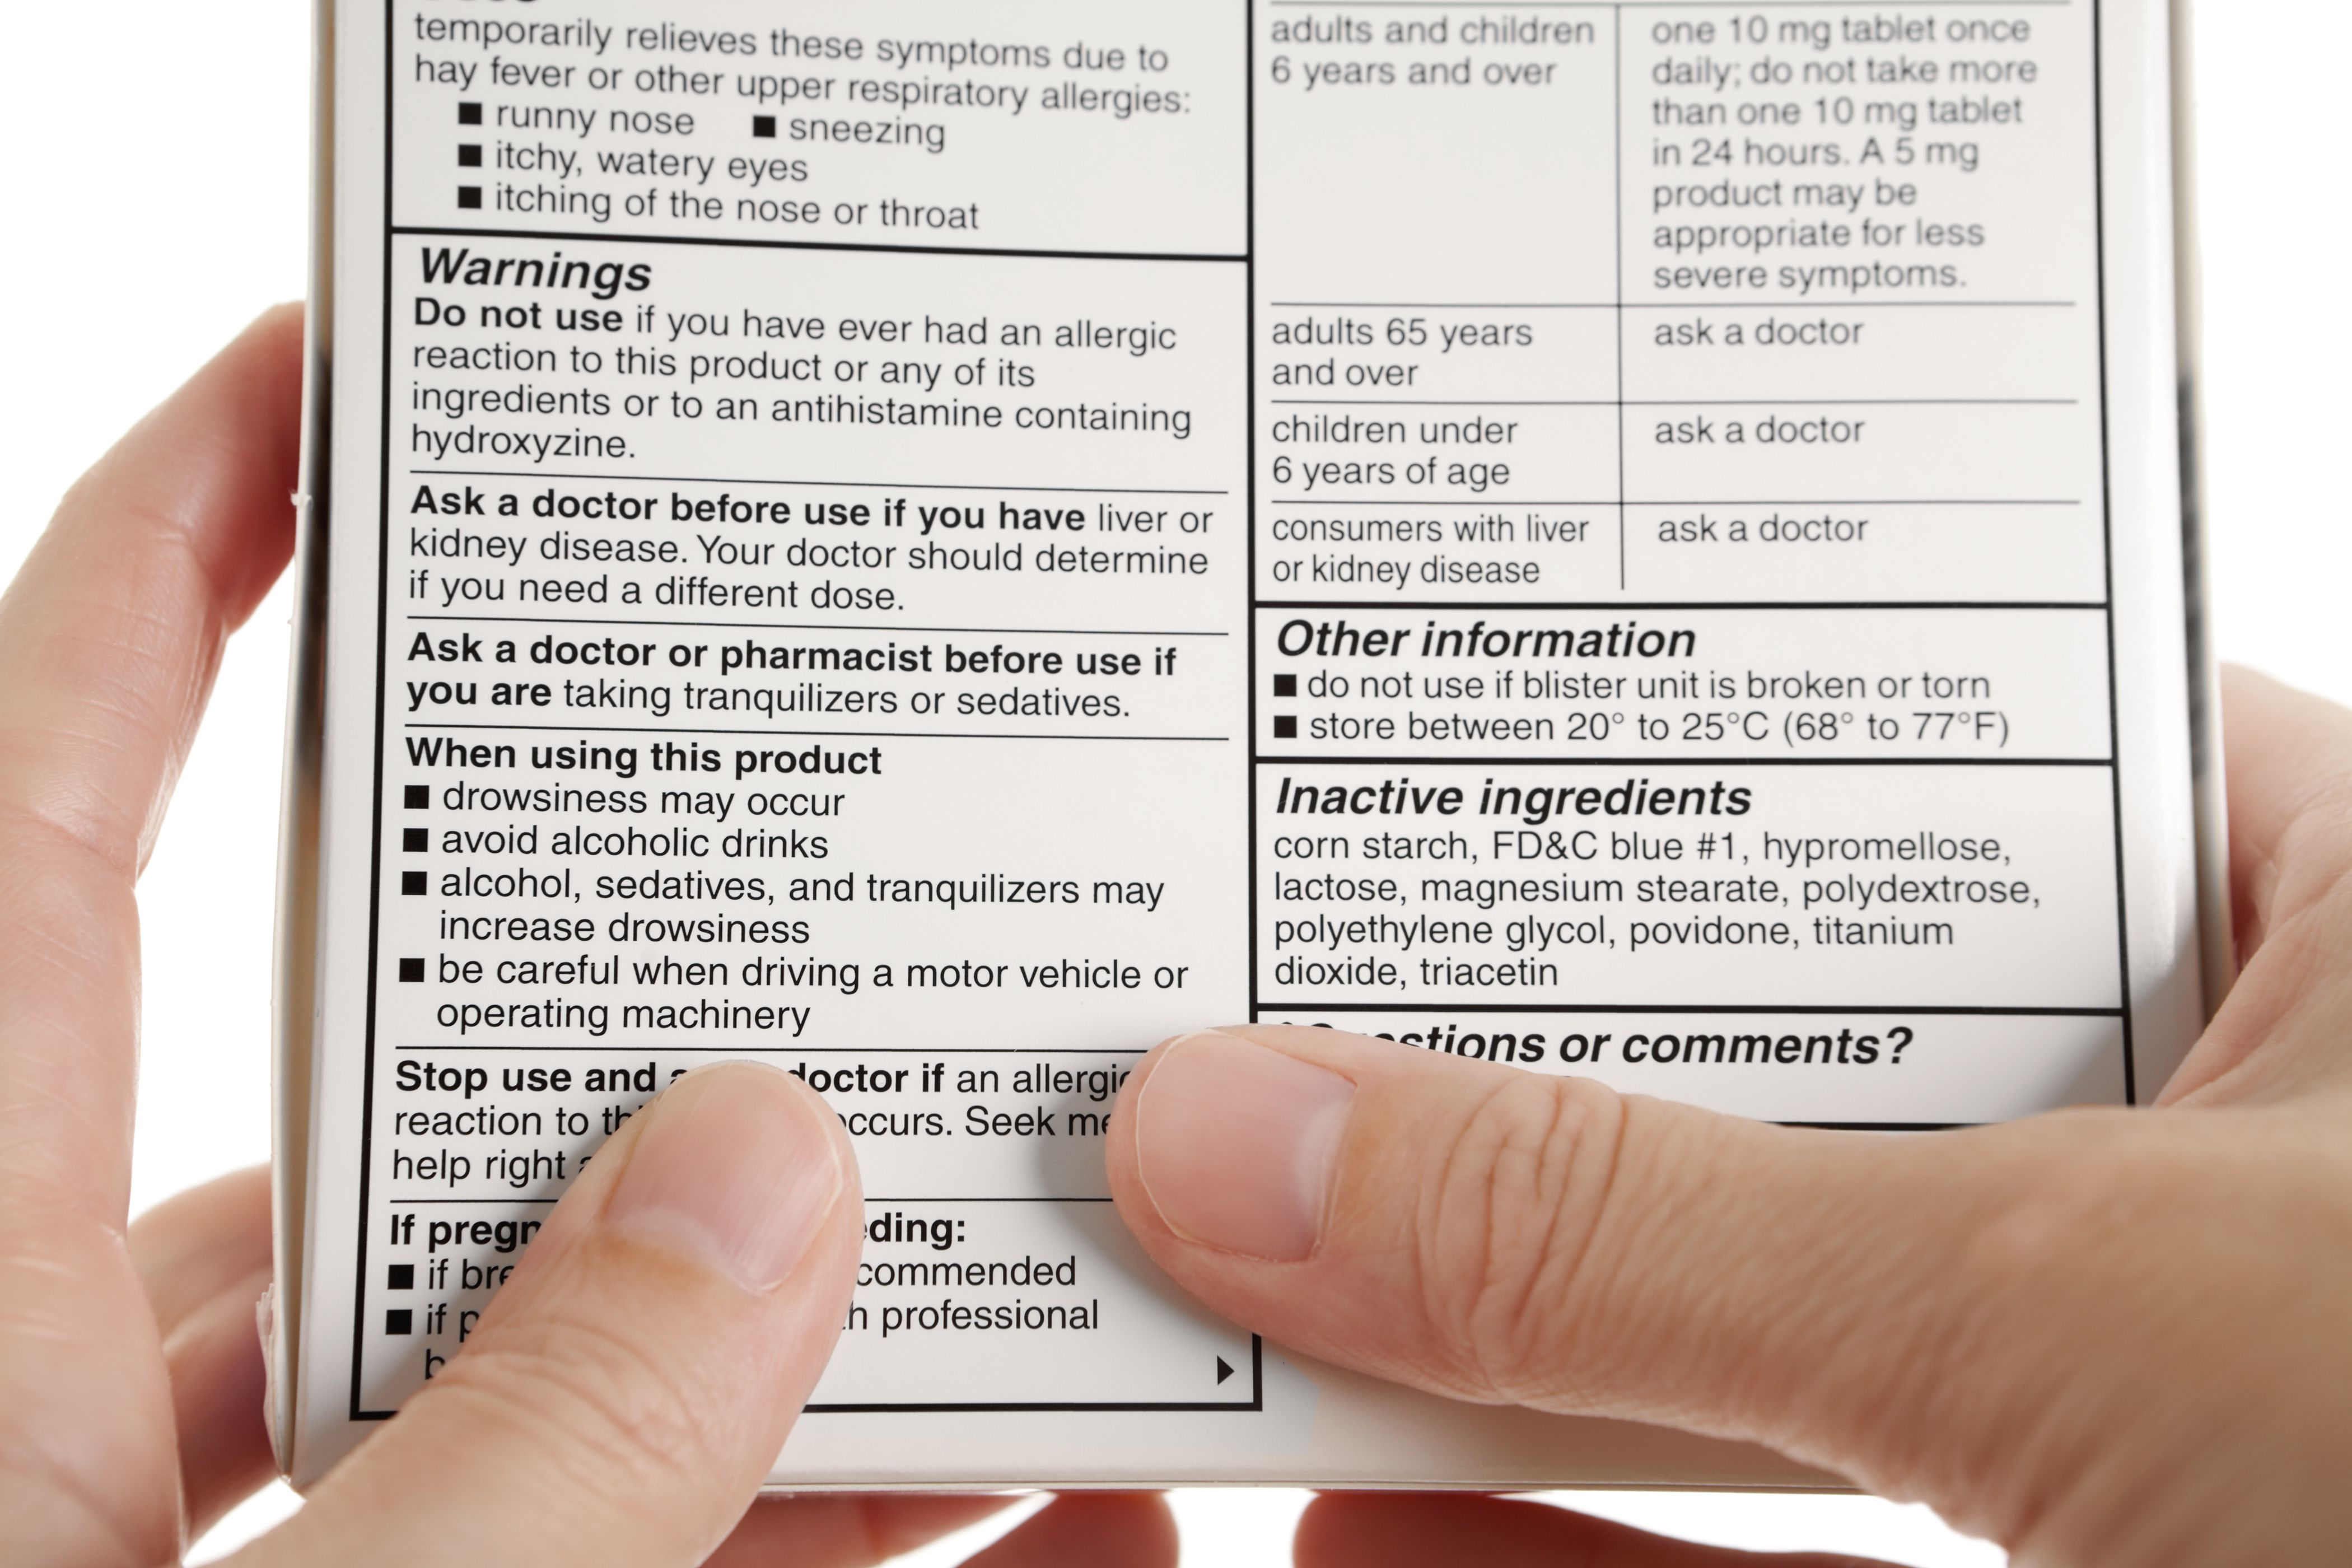 Allegra Over The Counter Drug Information